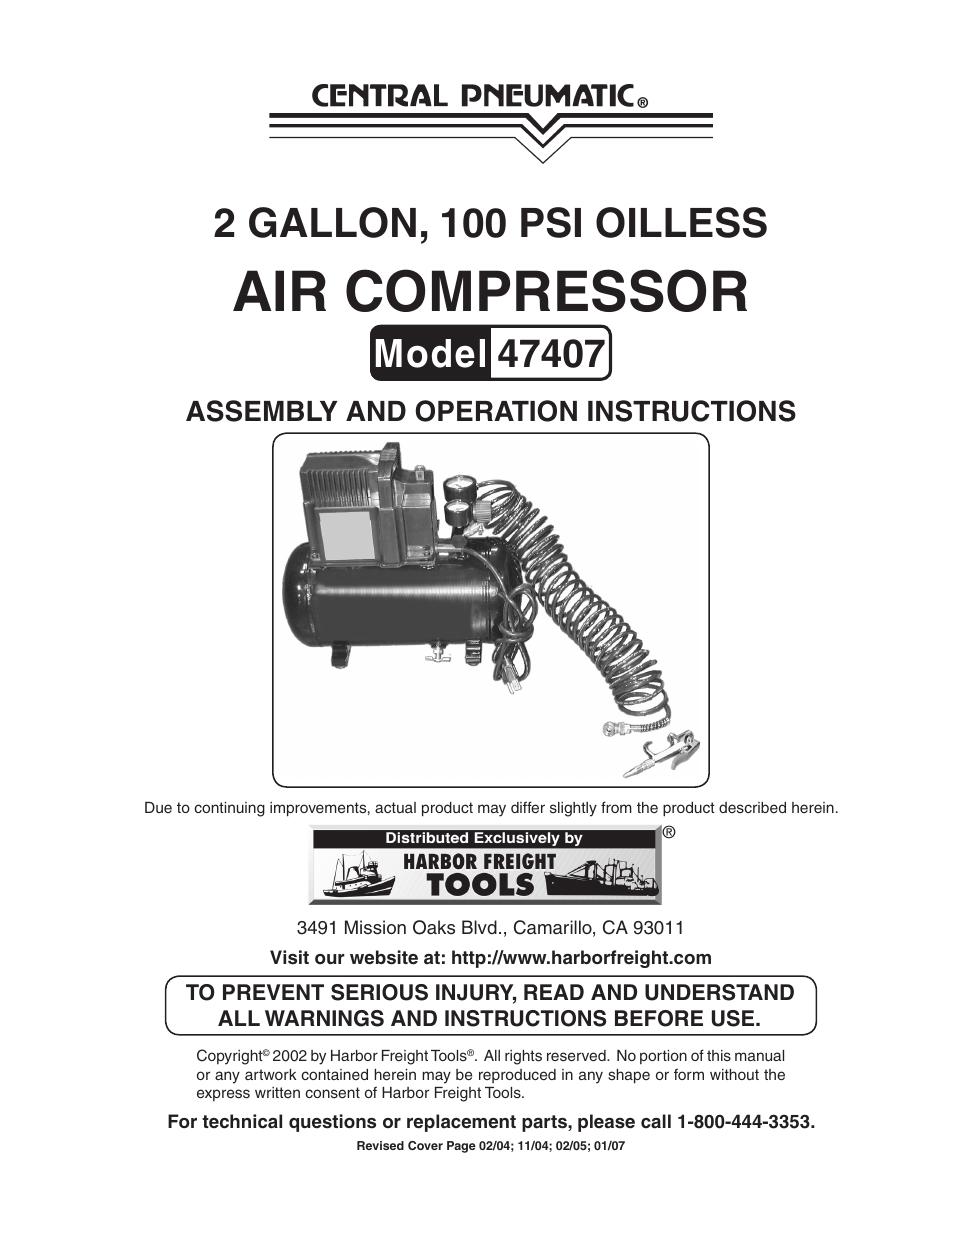 medium resolution of harbor freight tools central pneumatic 47407 user manual